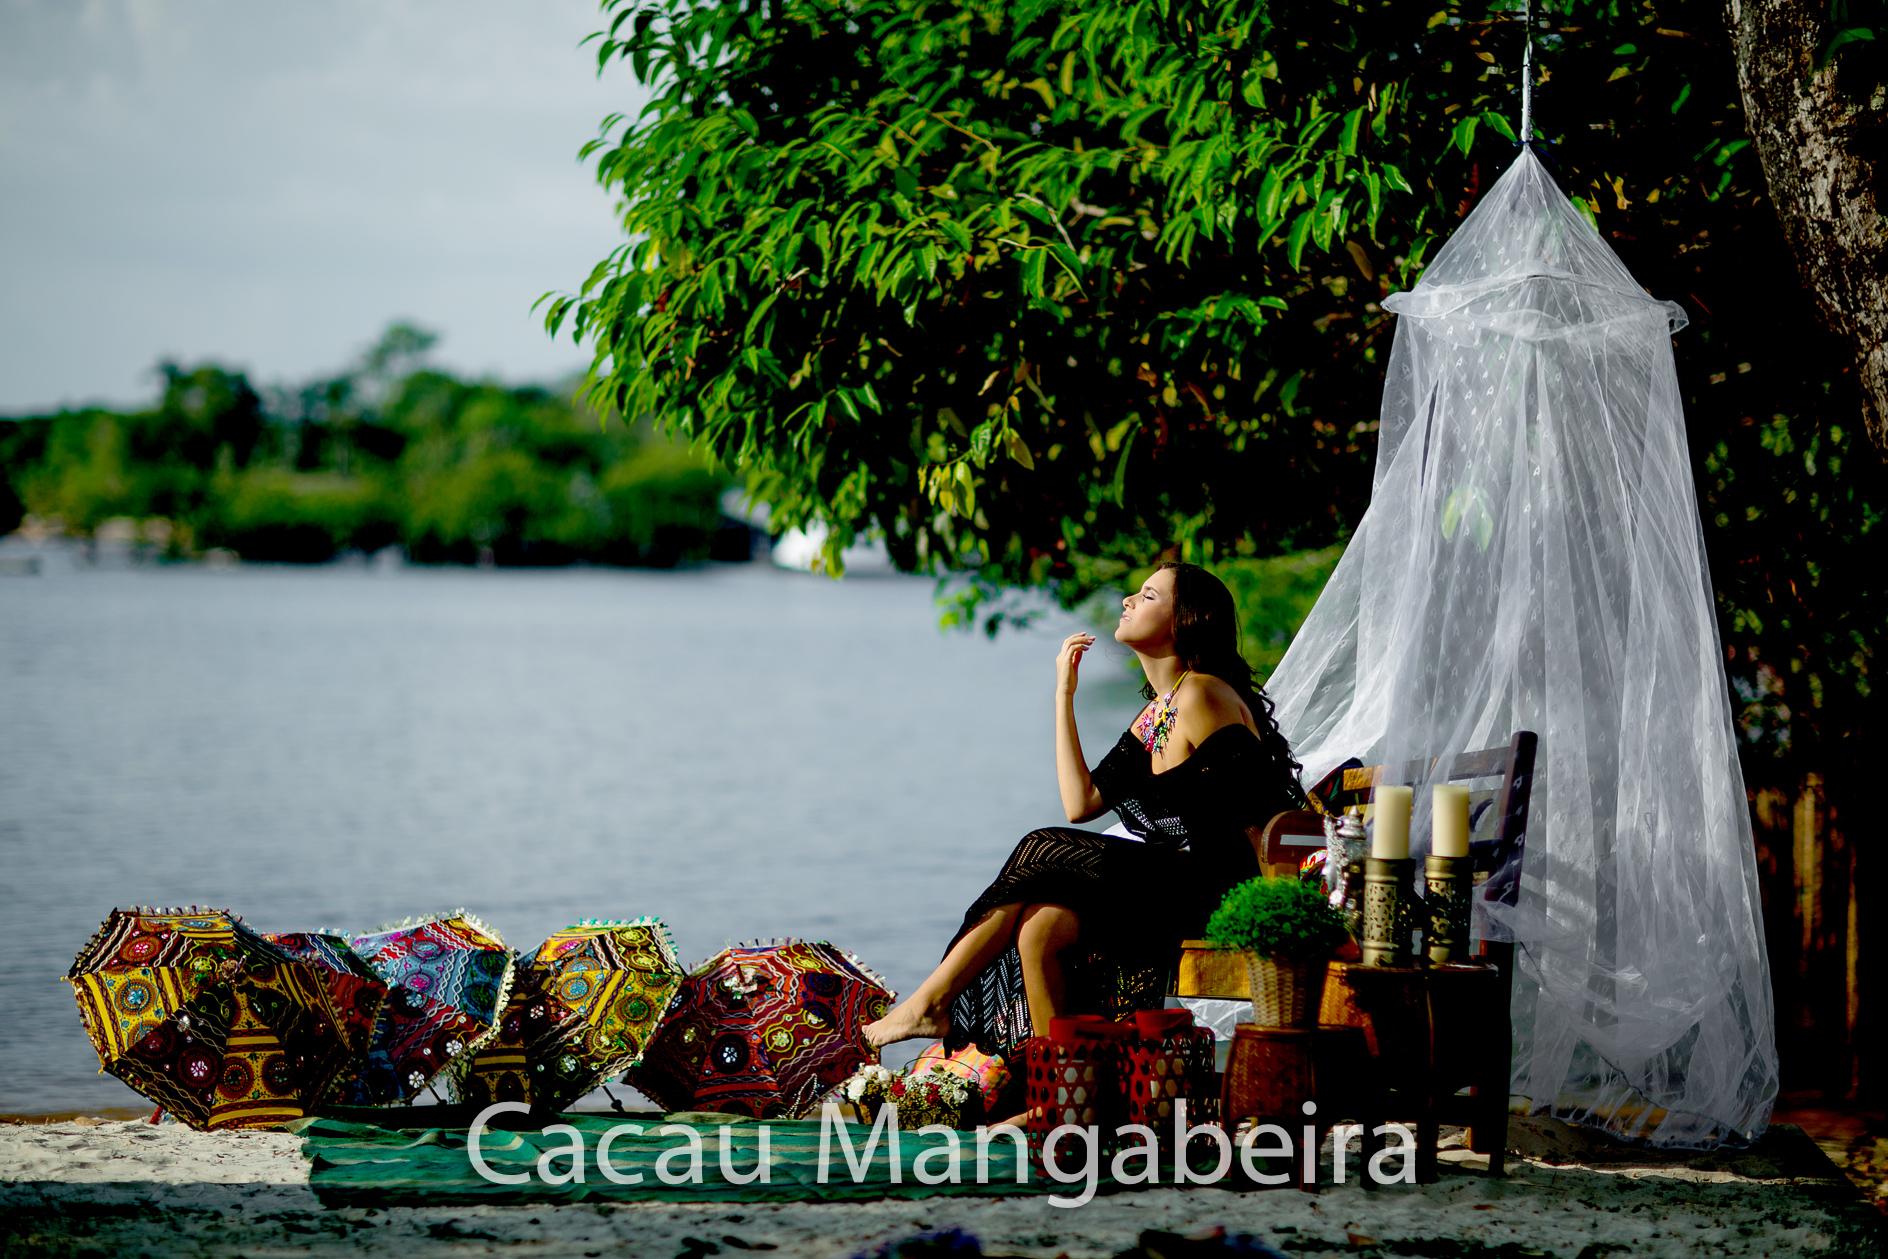 Anabeatriz-cacaumangabeira